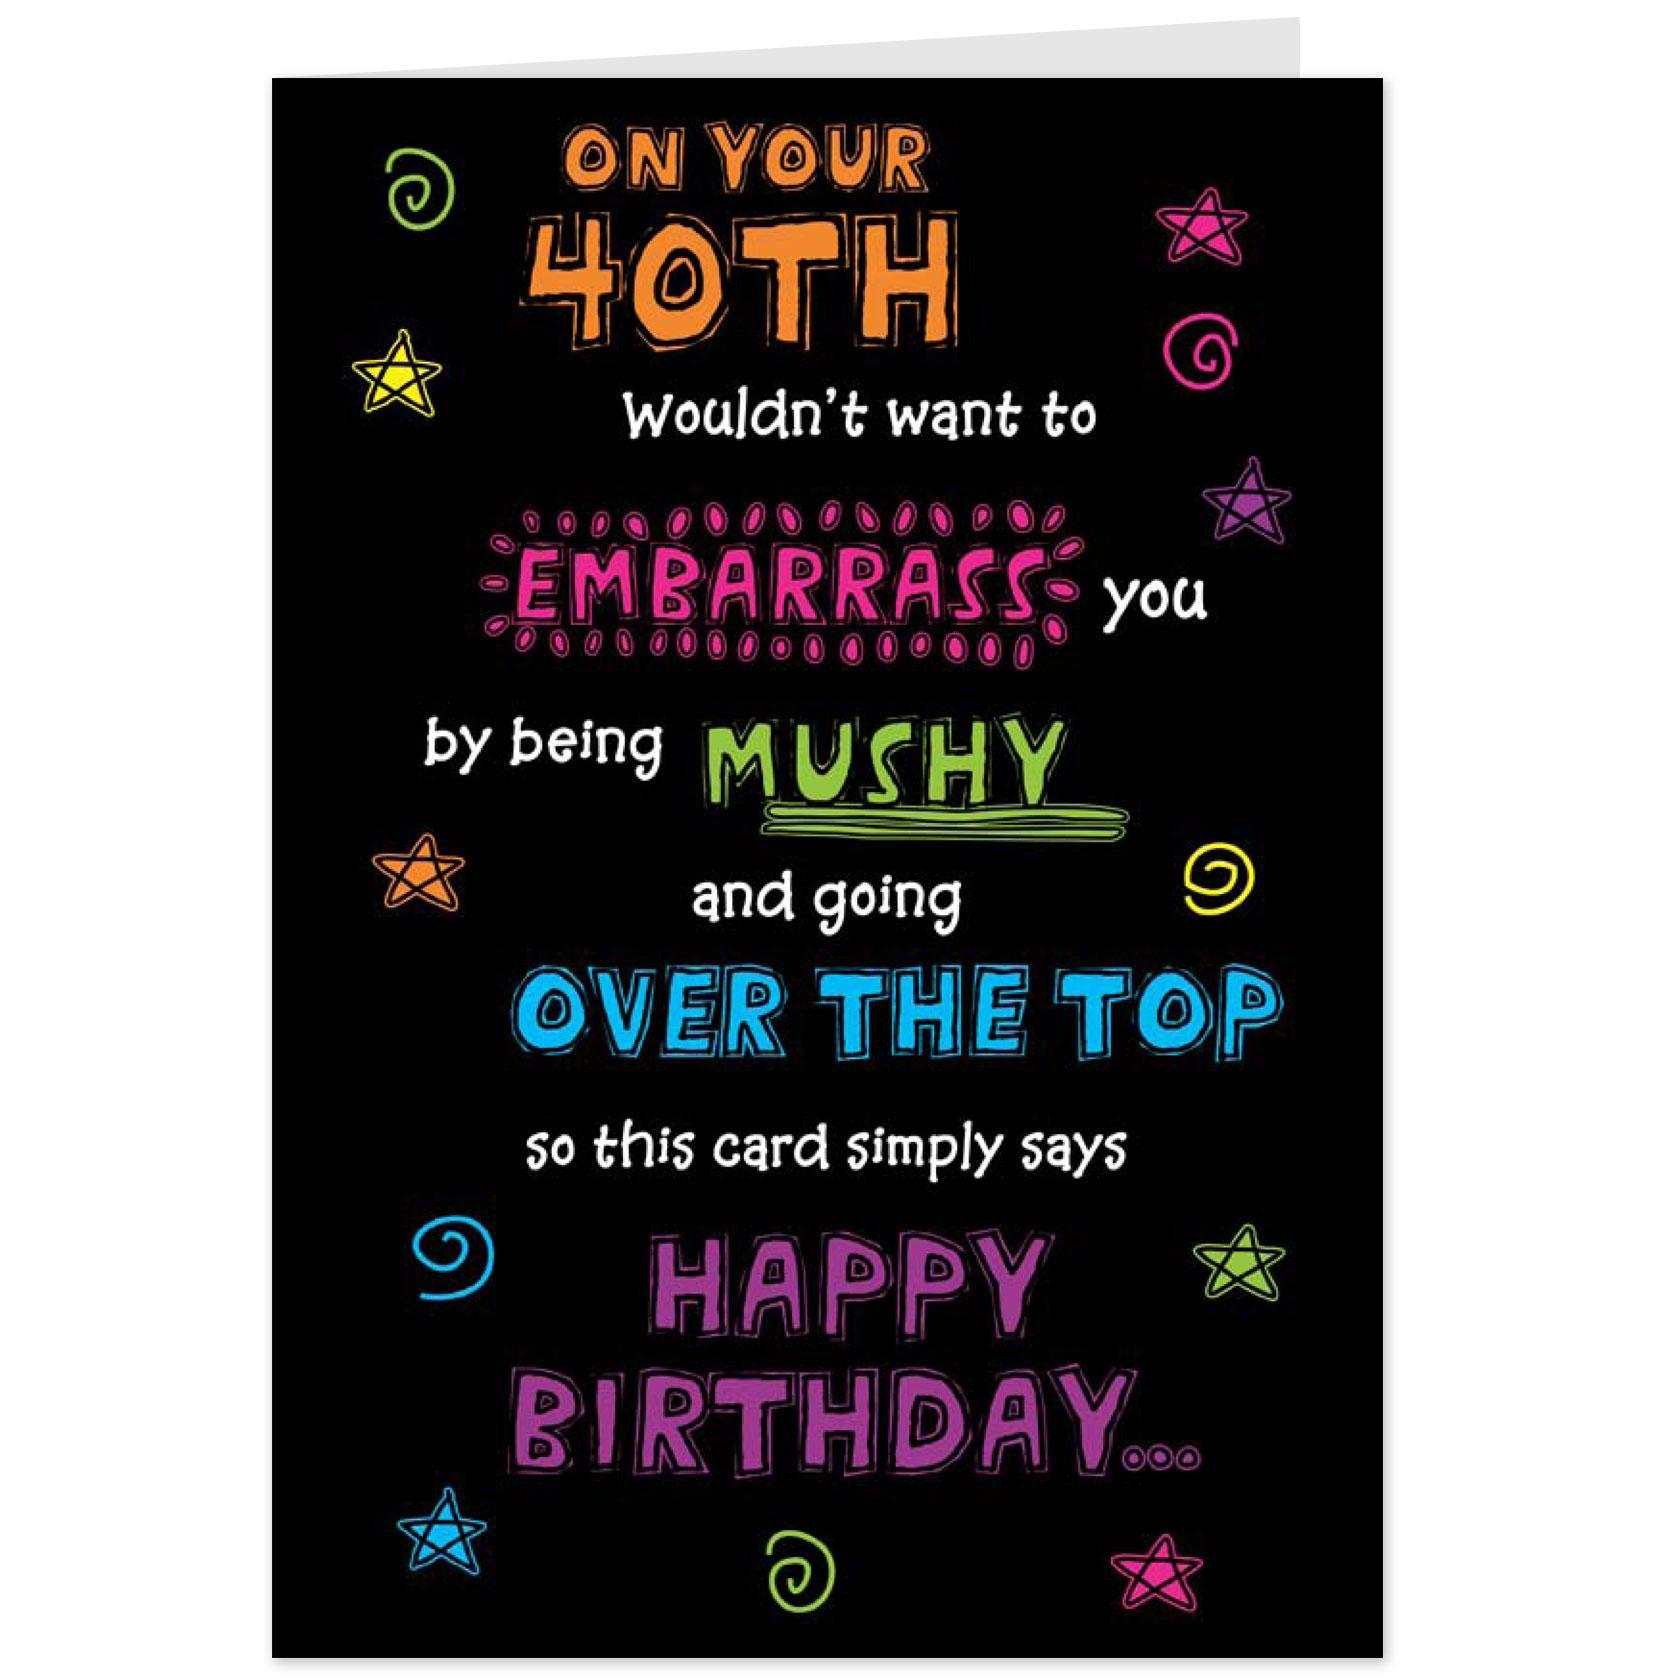 40 Birthday Quotes For Women Quotesgram: 40th Birthday Jokes Quotes. QuotesGram